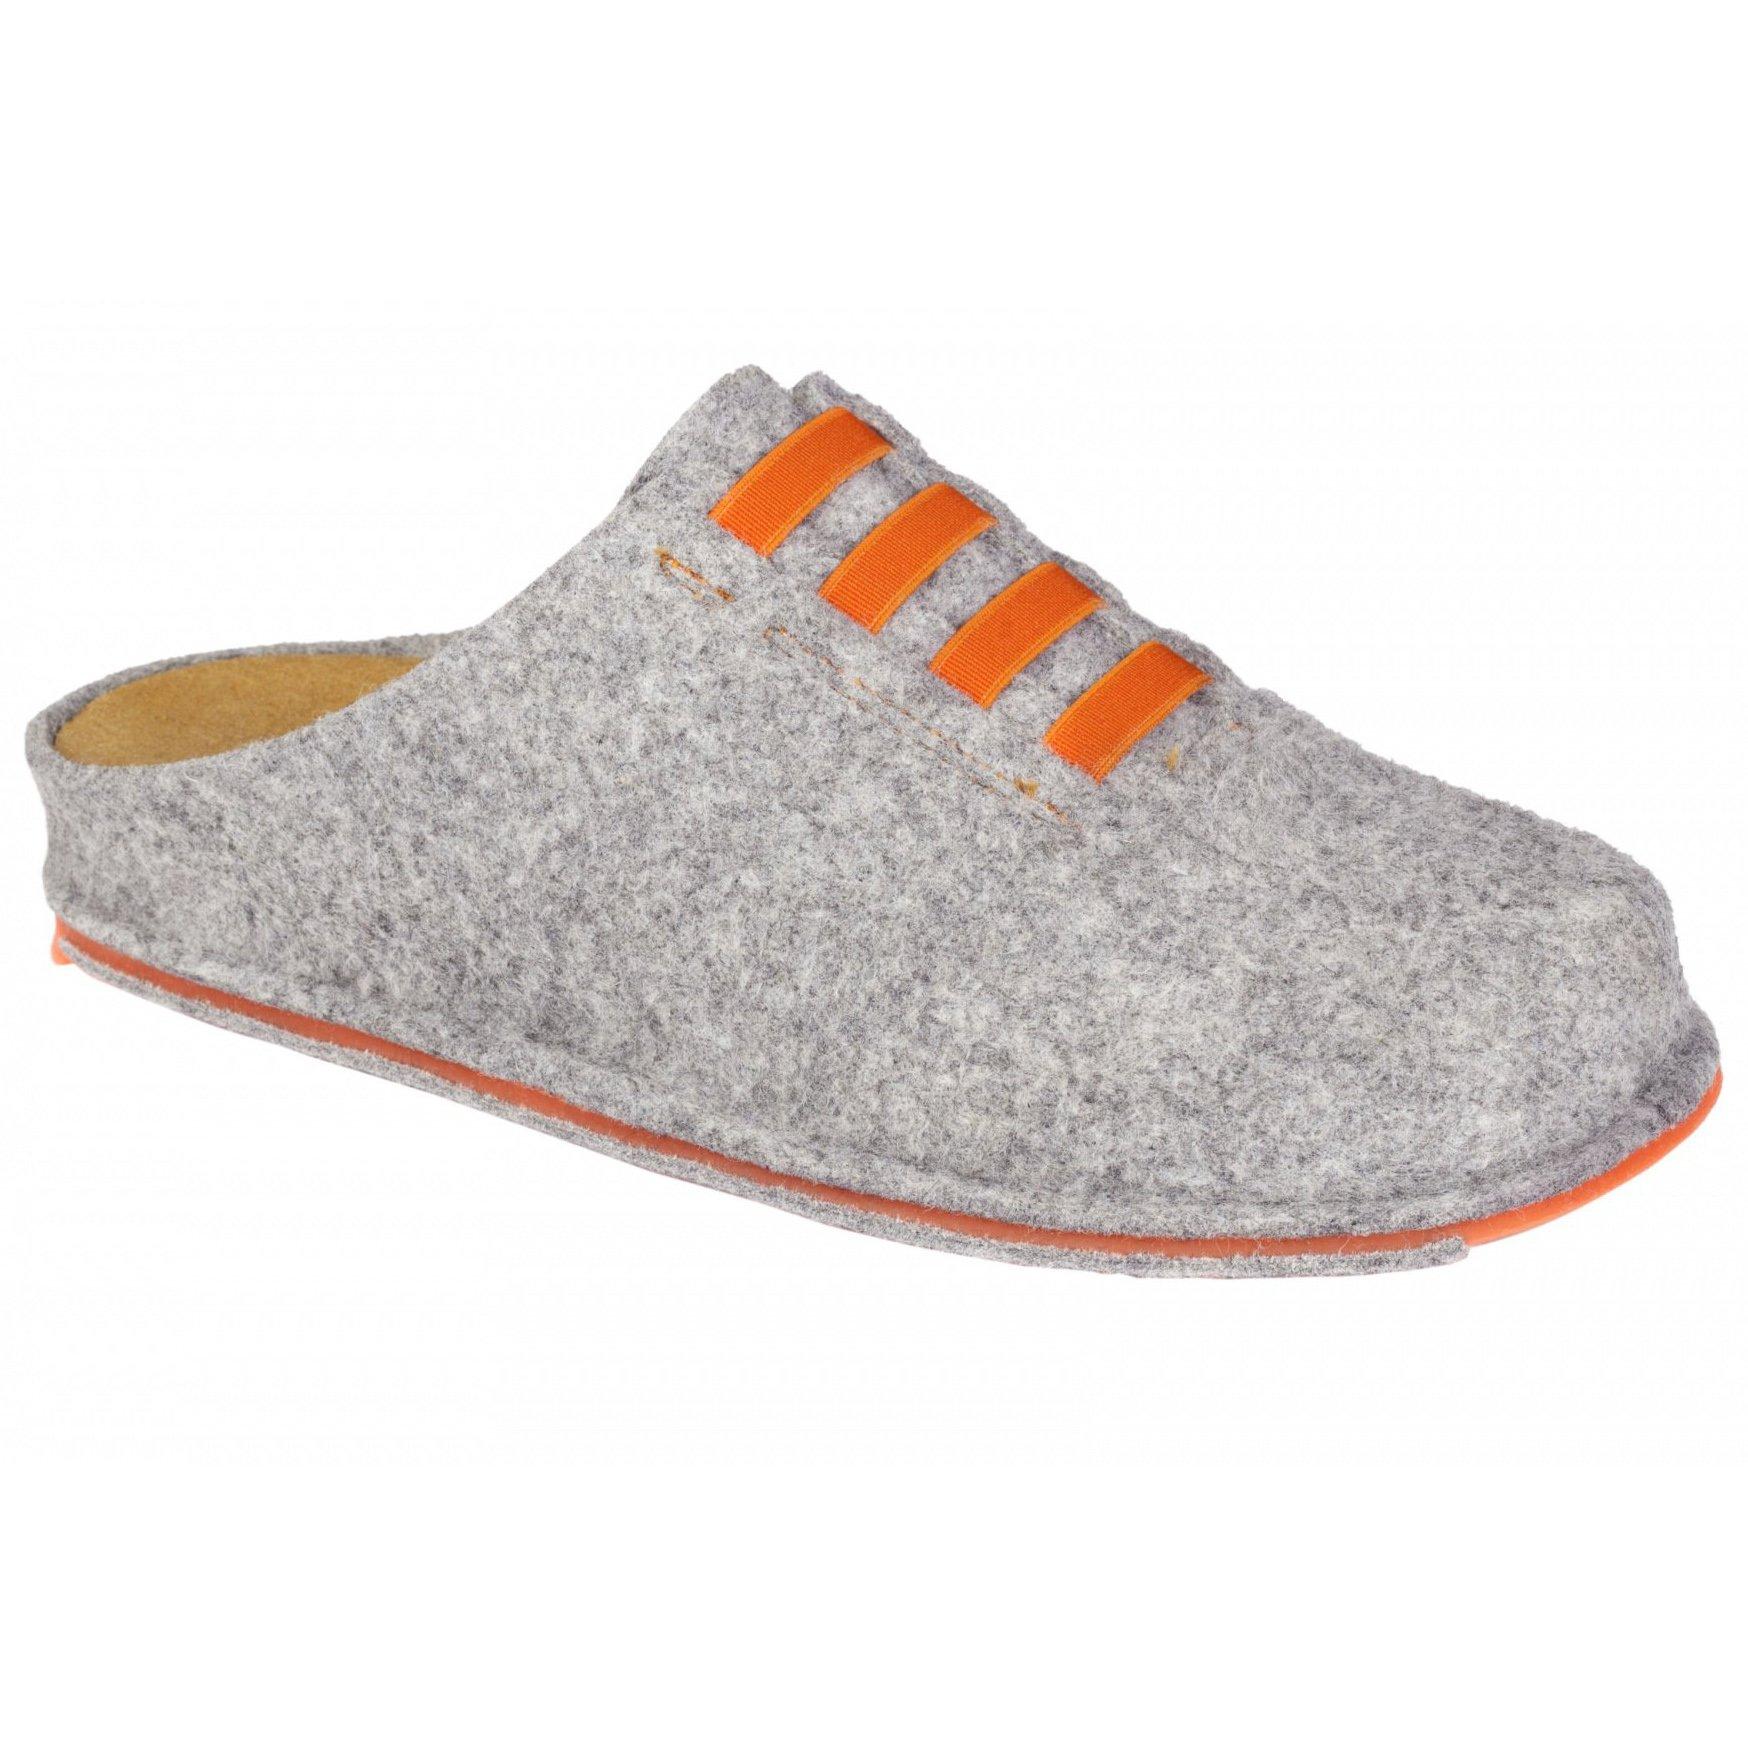 Dr Scholl Shoes Spikey10 Γκρι-Πορτοκαλί Γυναικείες Ανατομικές Παντόφλες Χαρίζουν φαρμακείο   ανατομικά παπούτσια   γυναικεία ανατομικά παπούτσια